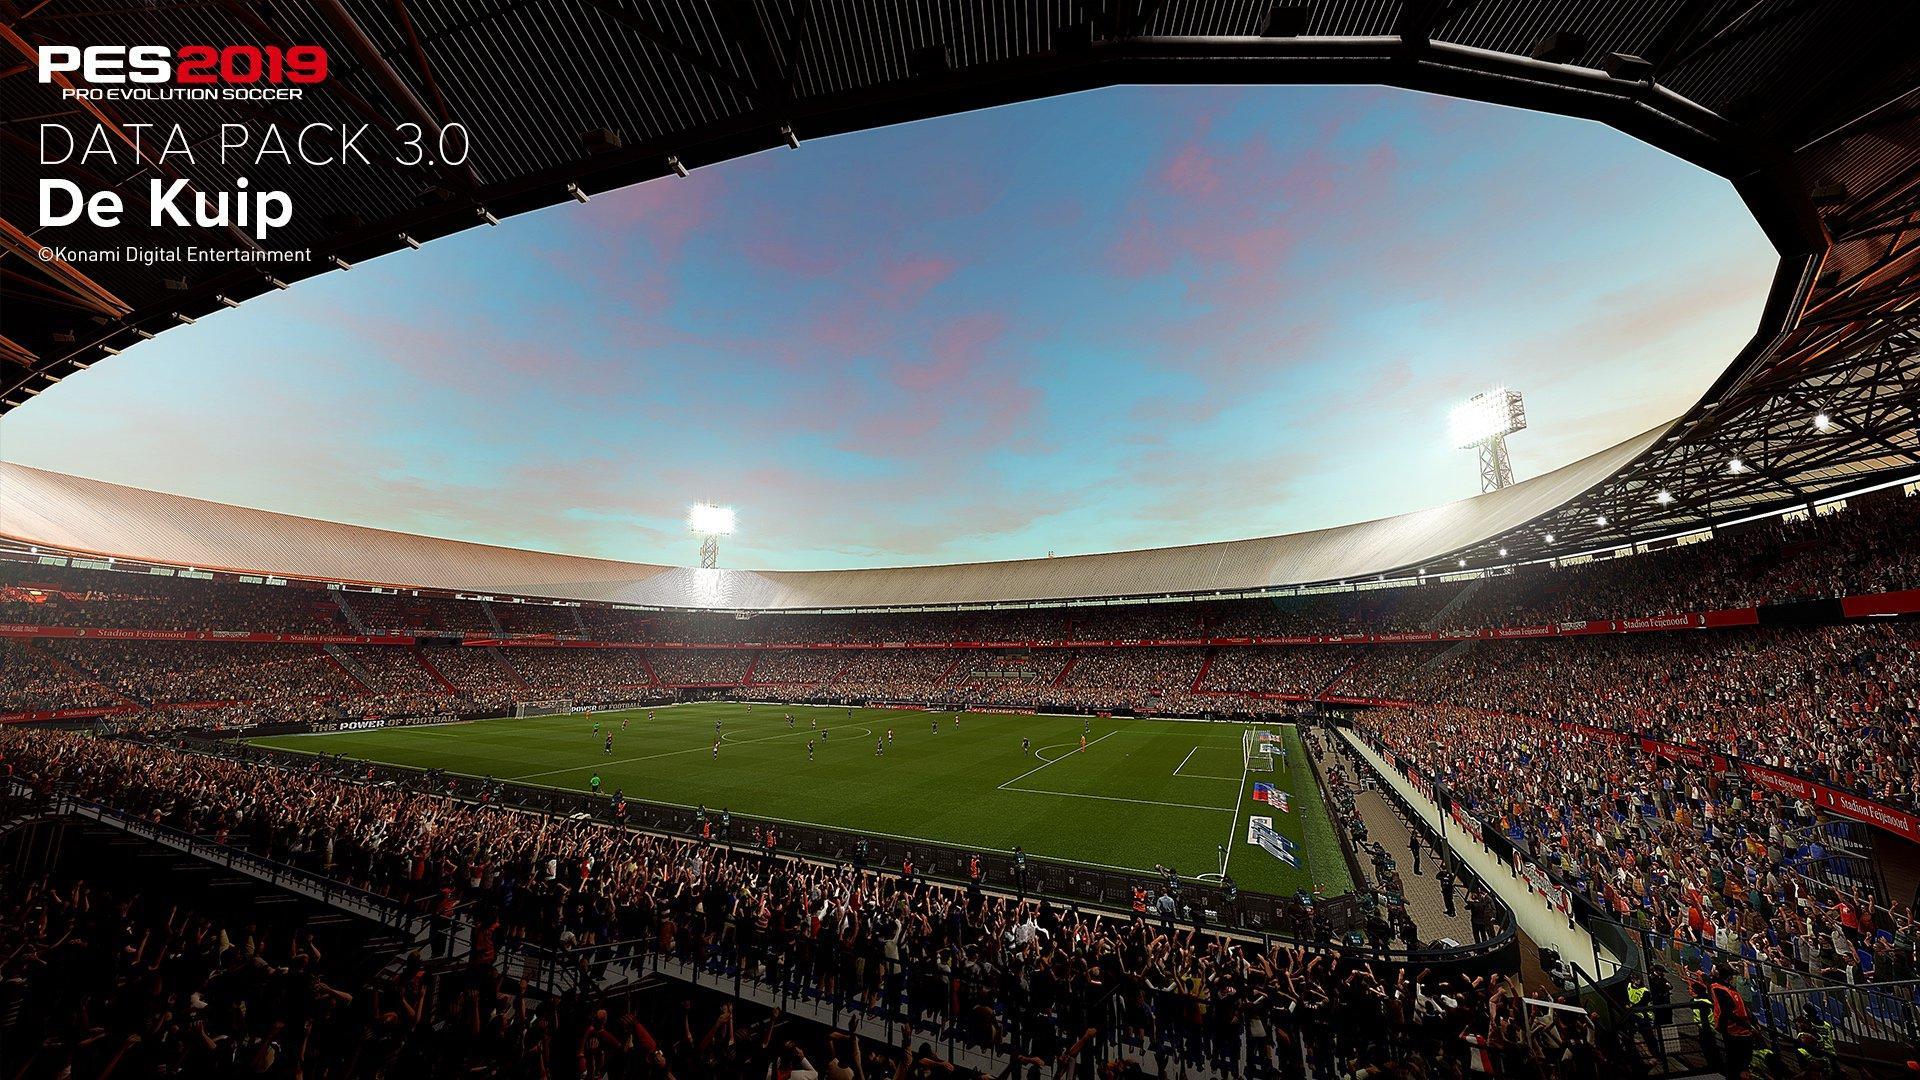 De Kuip Pes 2020 All Stadiums Pro Evolution Soccer 2020 Efootball Database